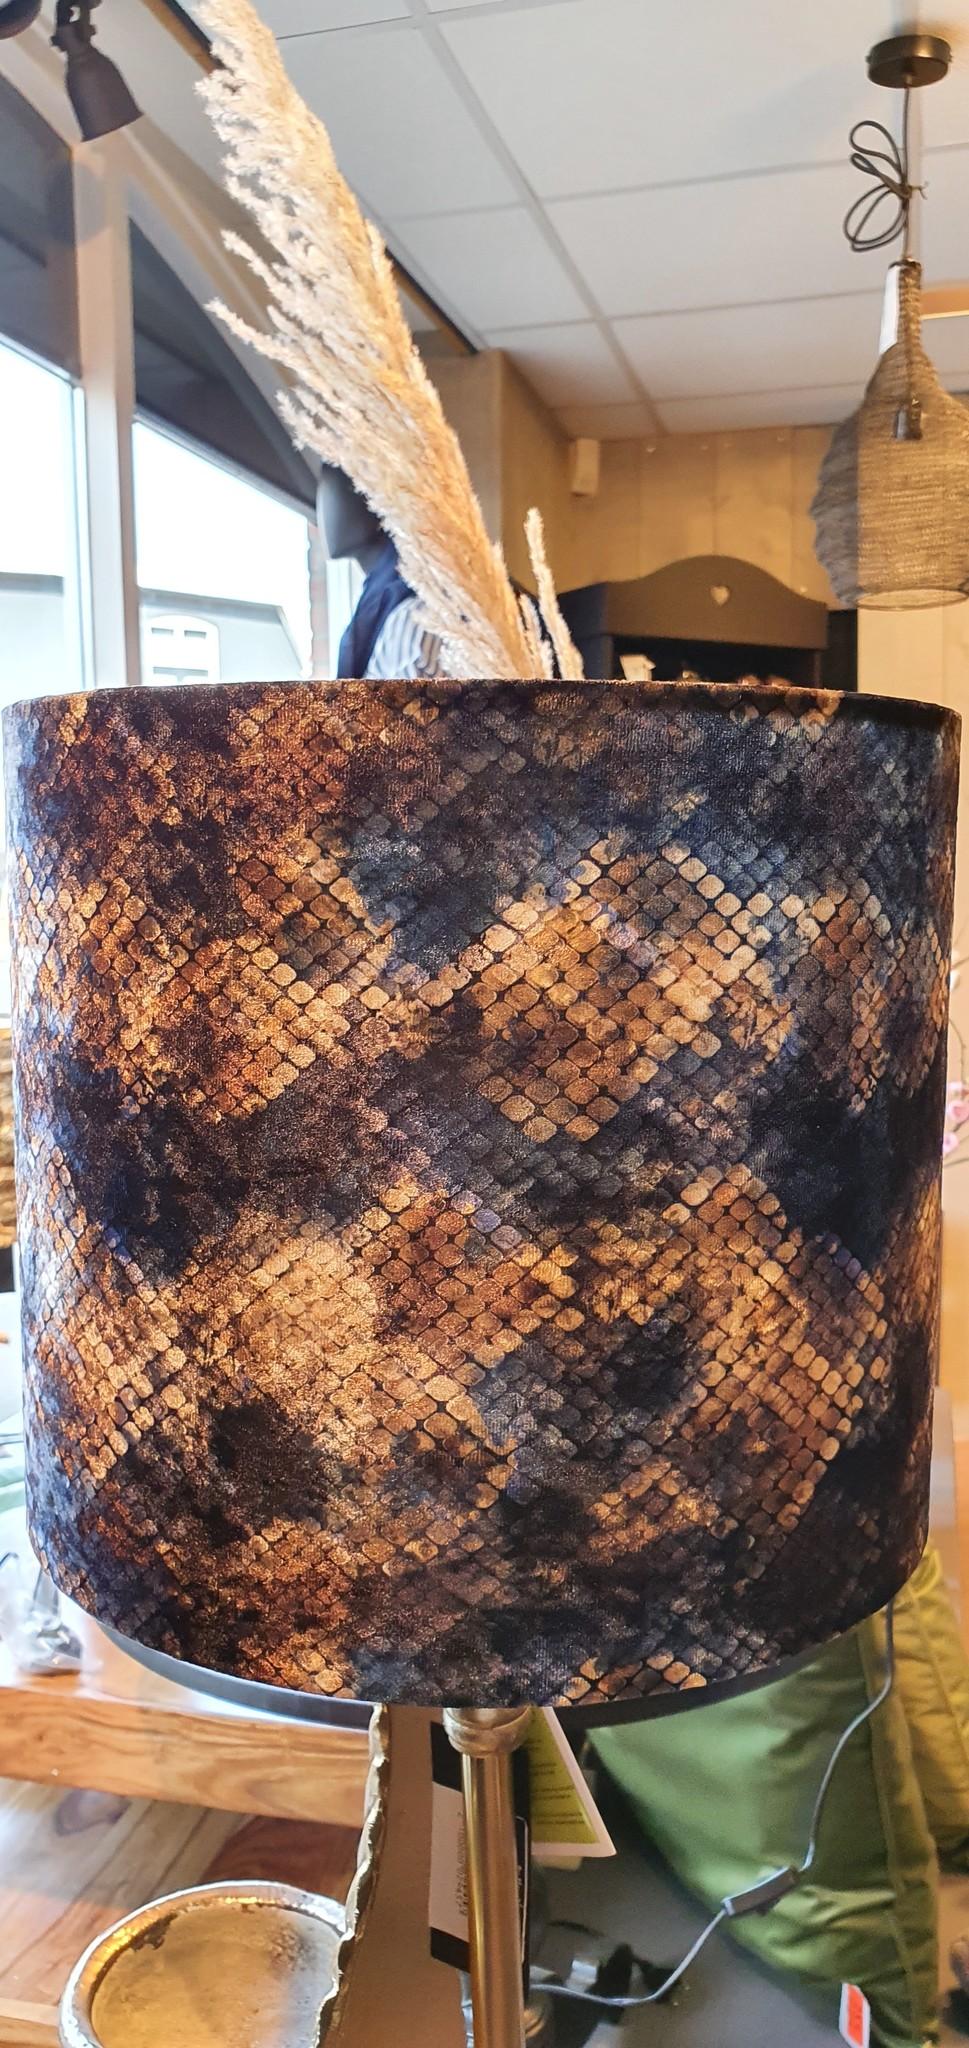 Kap Snake Blue on White 30x30x26cm